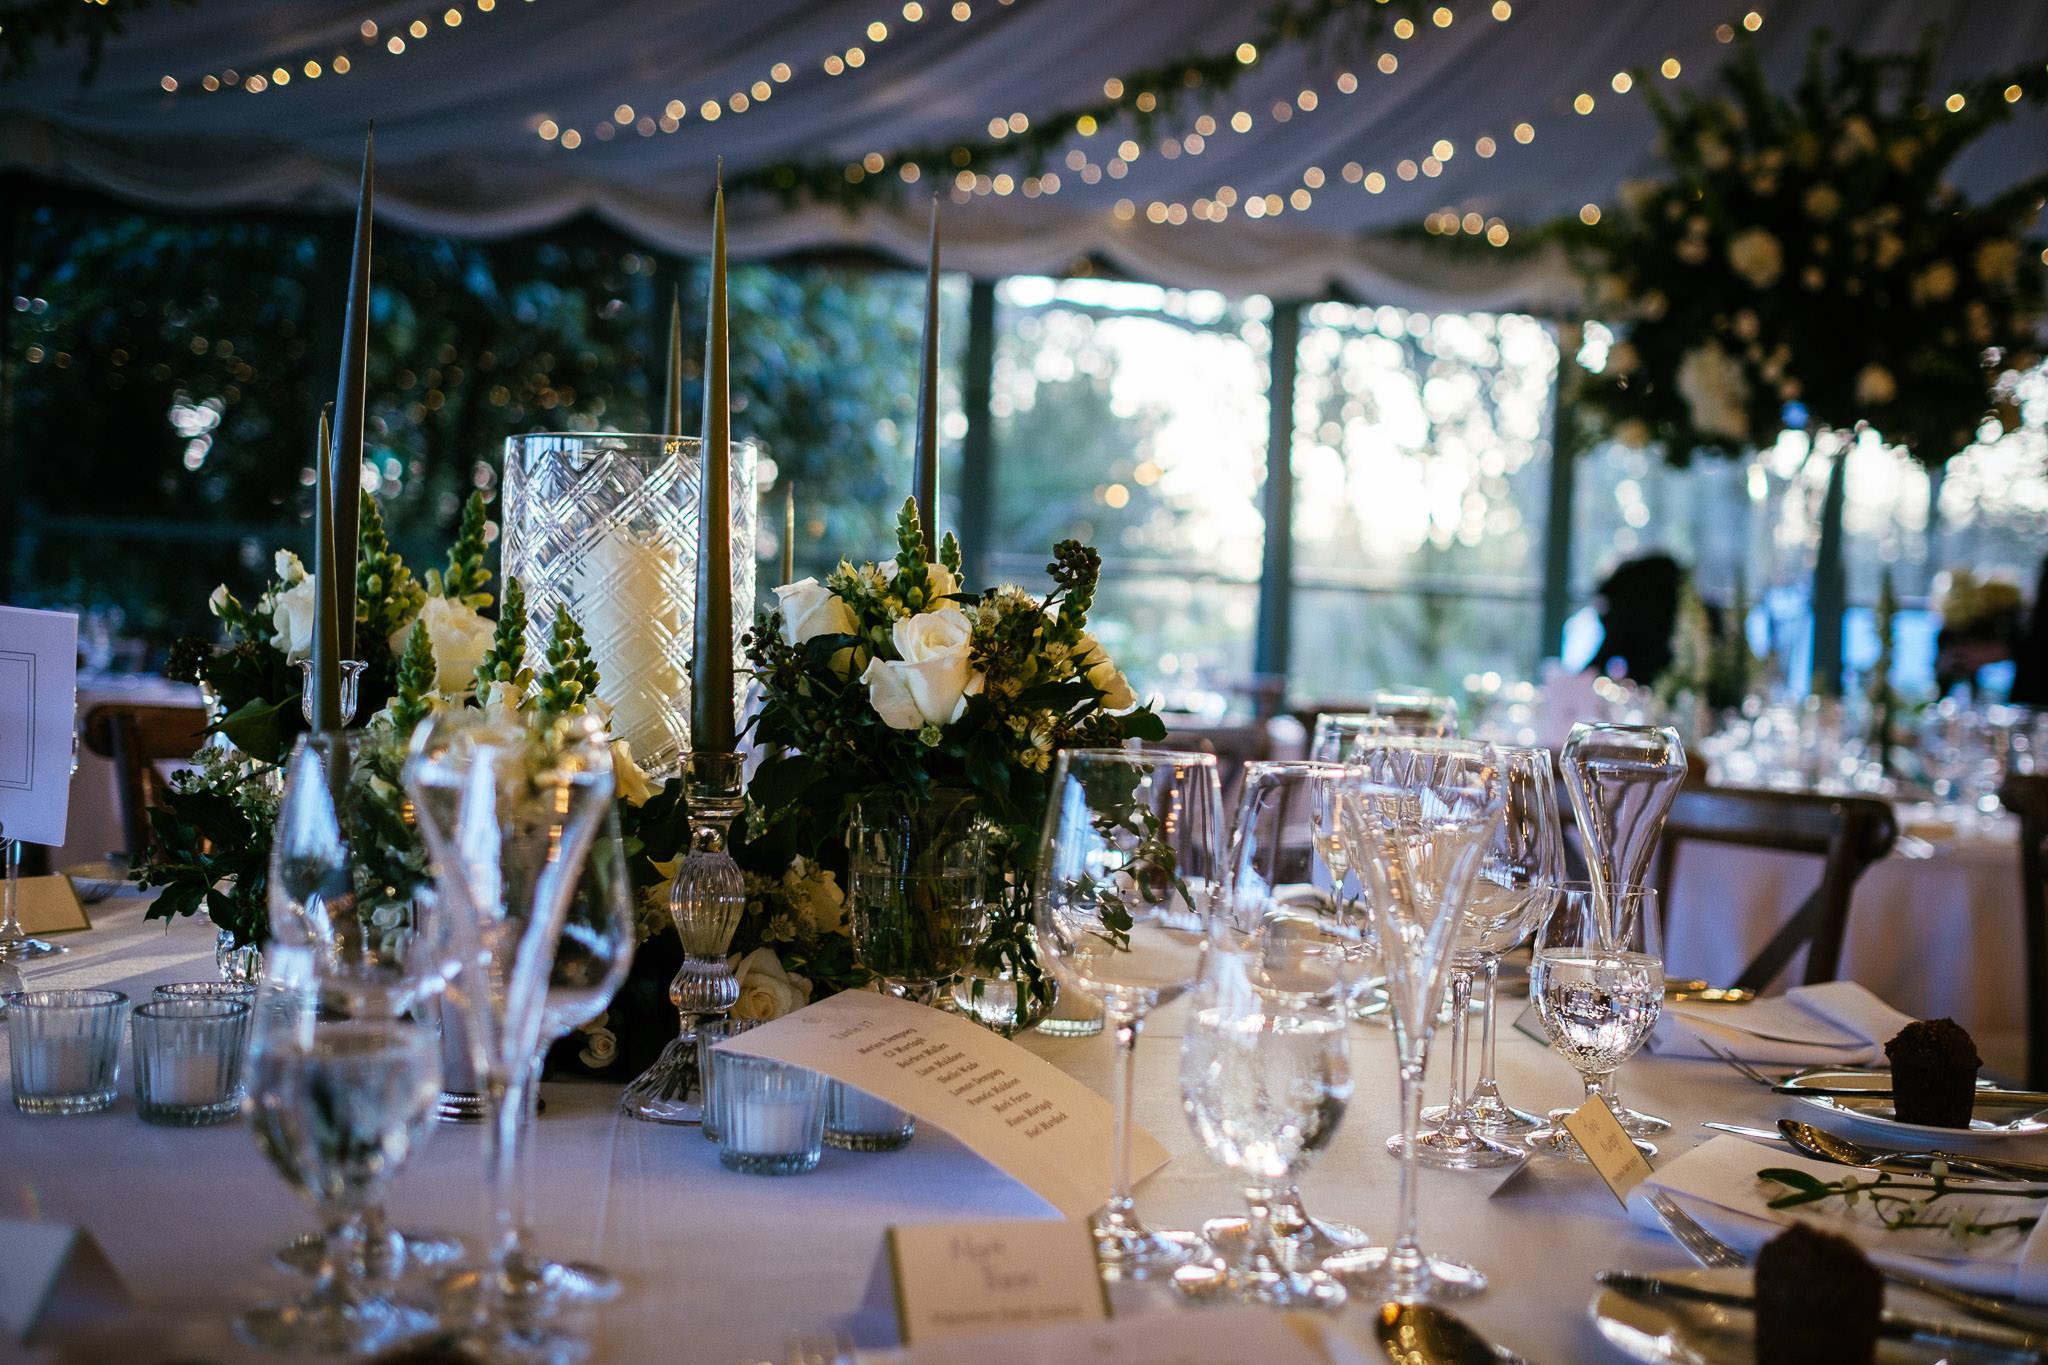 table setup at Virginia Park Lodge wedding